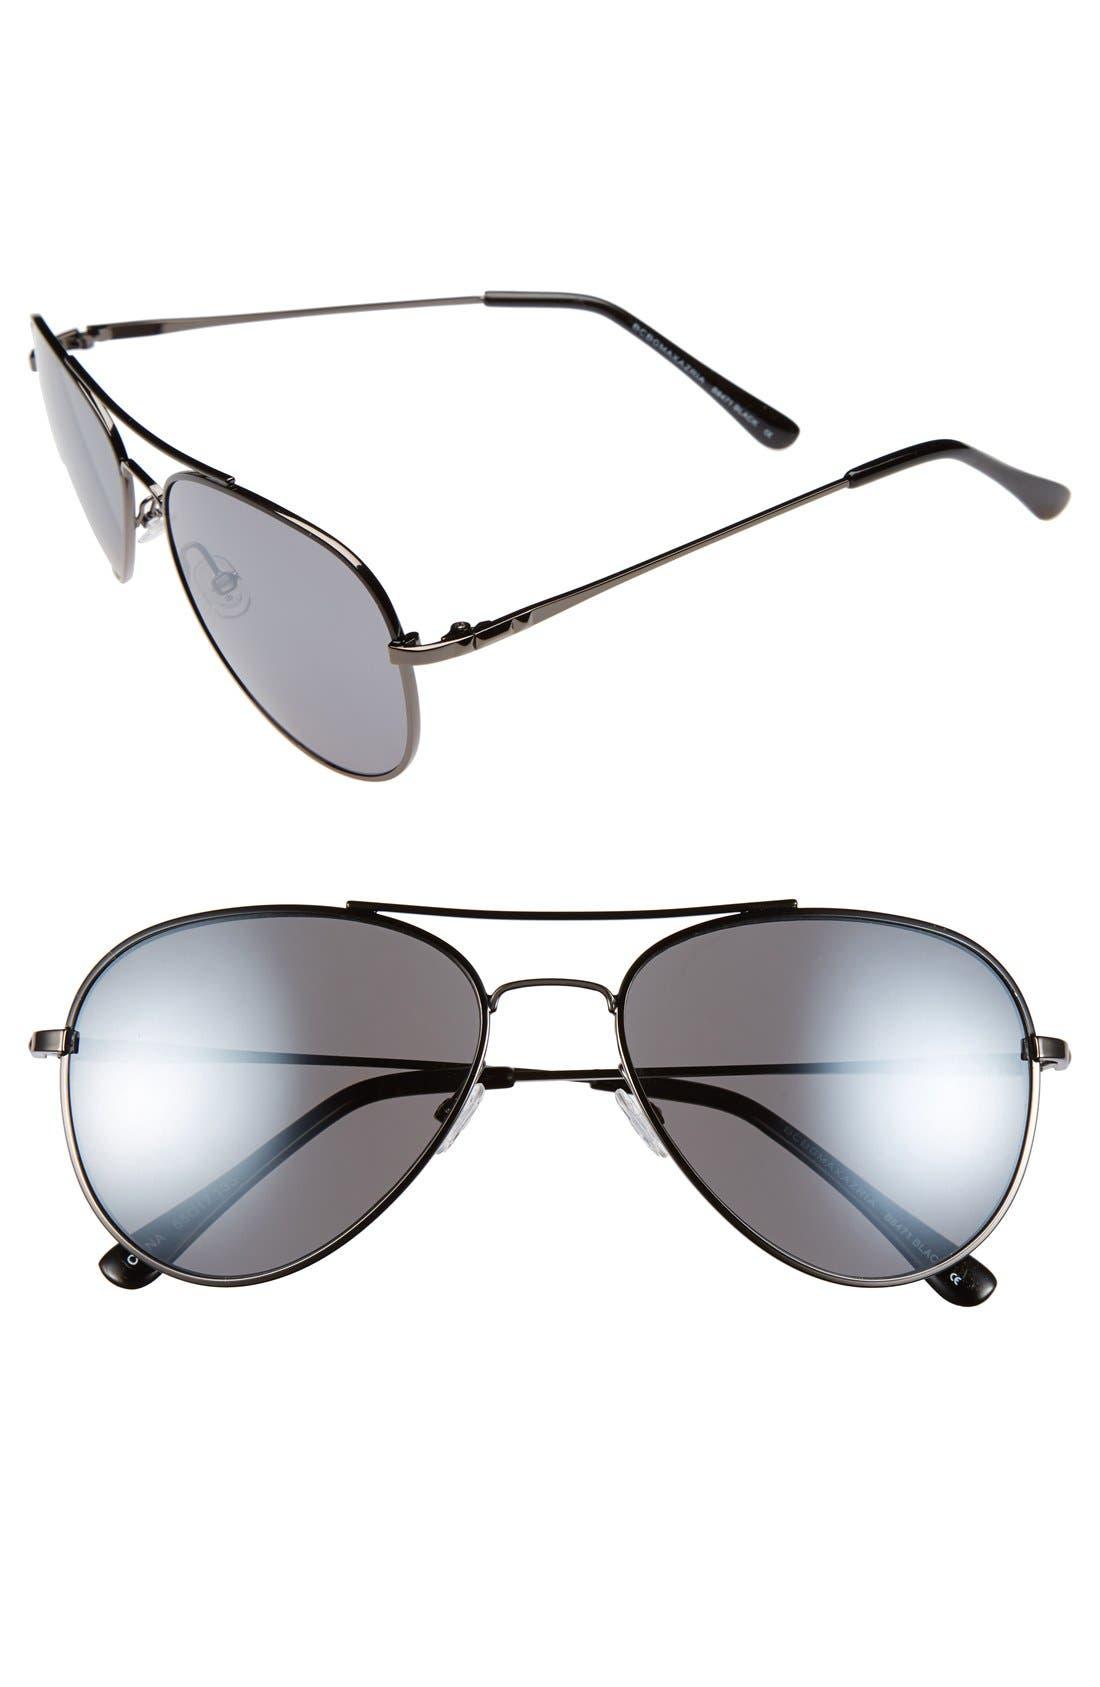 BCBGMAXAZRIA, 55mm Aviator Sunglasses, Main thumbnail 1, color, 001